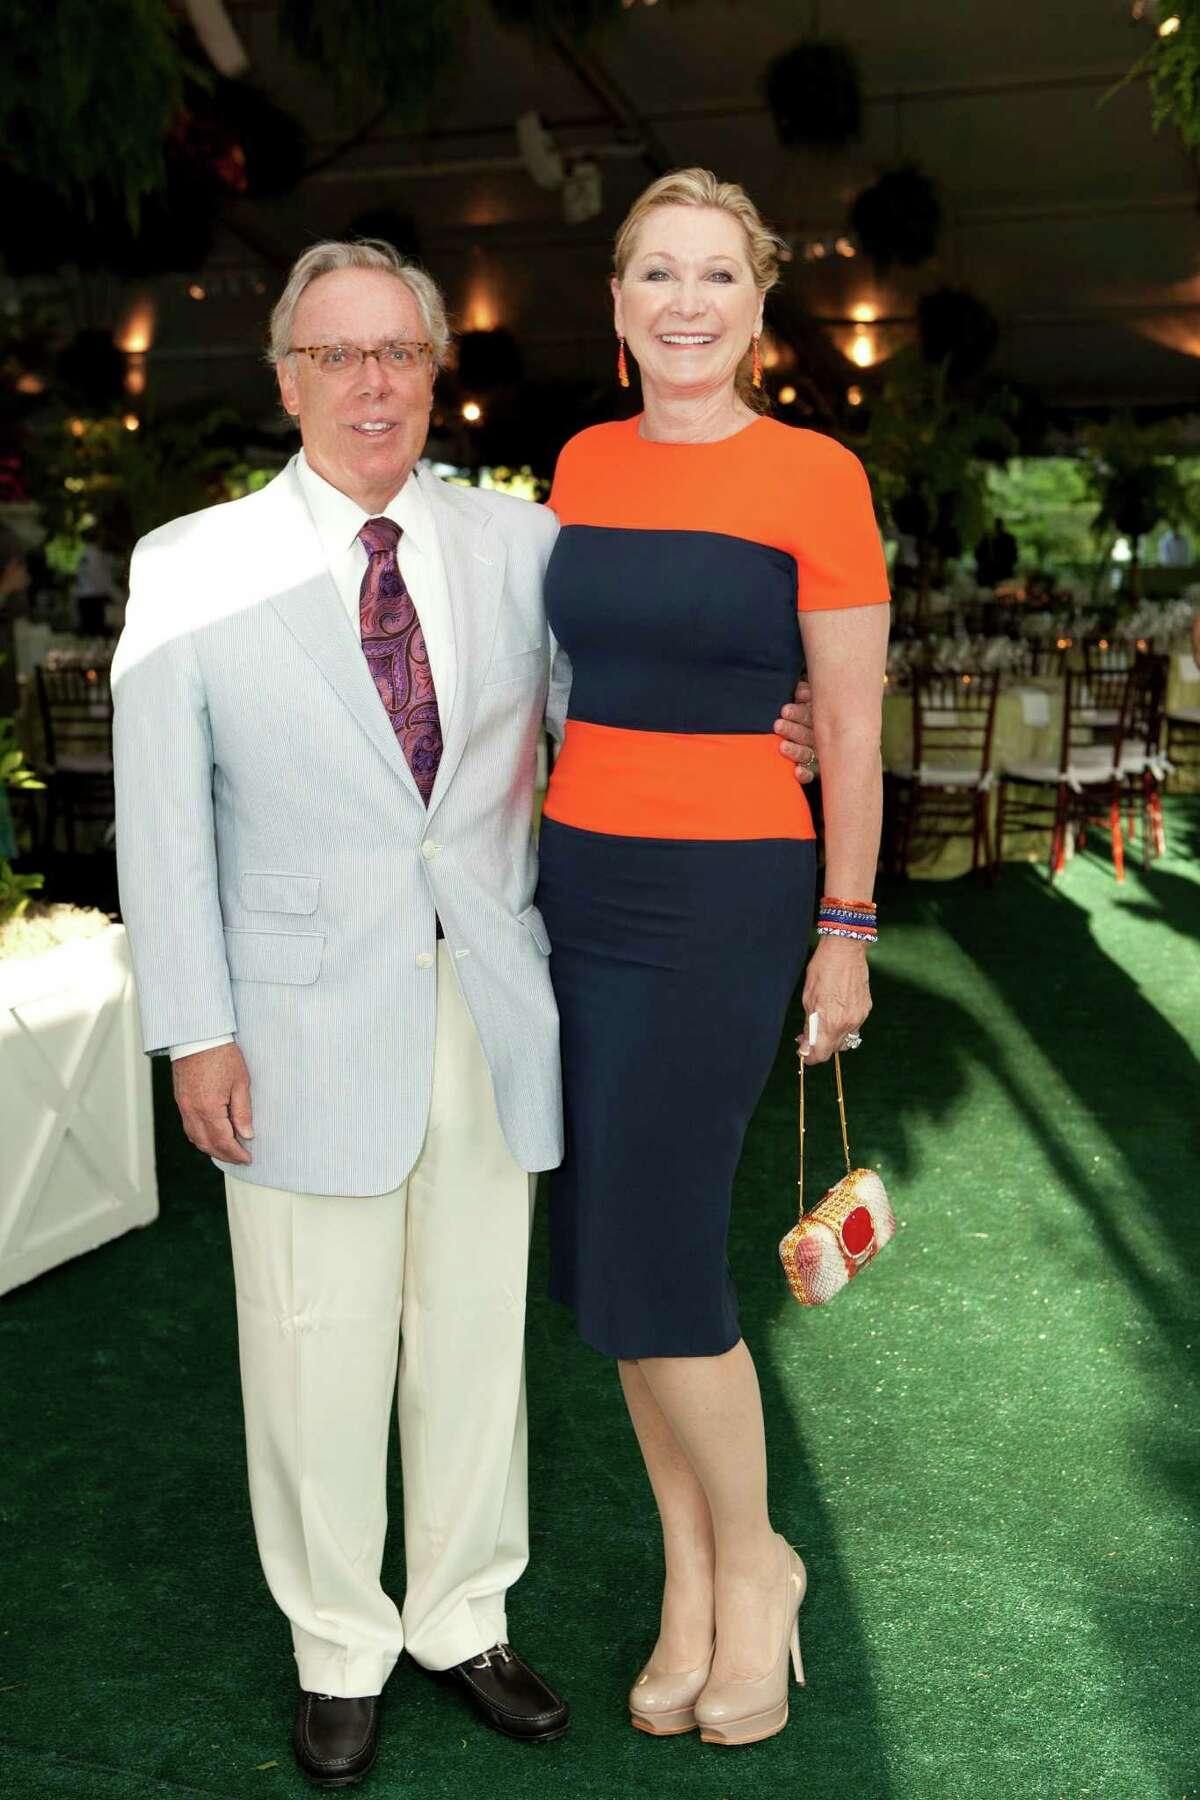 Michael and Carol Linn at the Bayou Bend Garden Party.